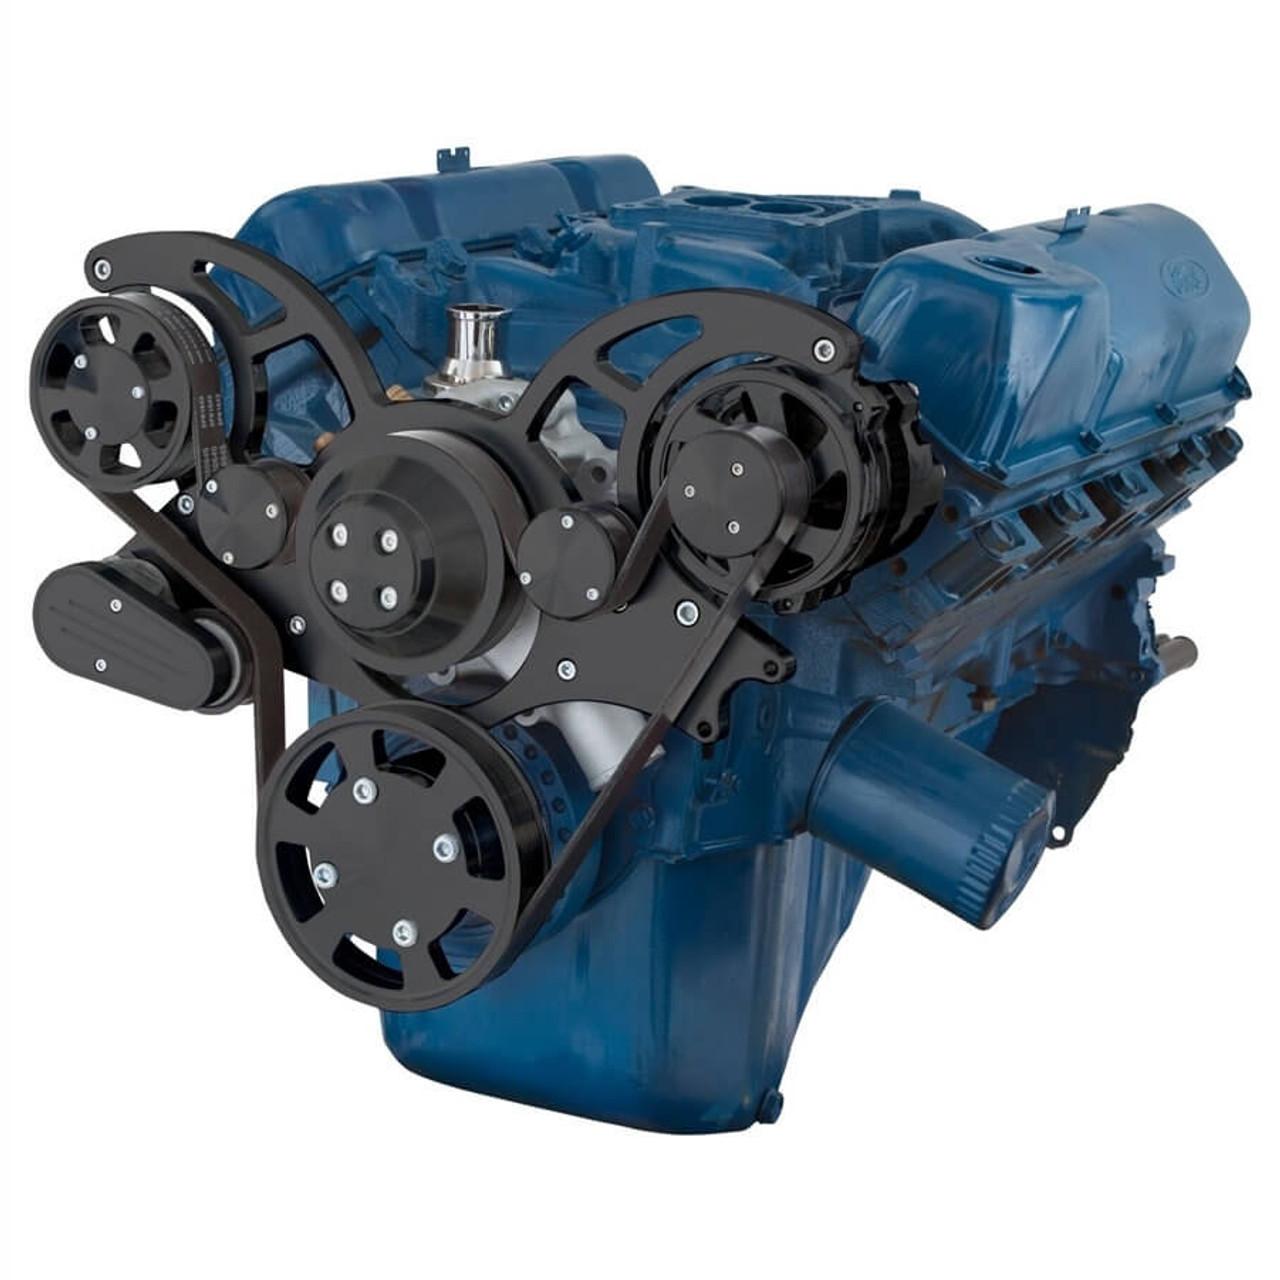 hight resolution of 1977 351 cleveland engine diagram wiring library 351 cleveland engine firing order 1977 351 cleveland engine diagram source ford 460 distributor